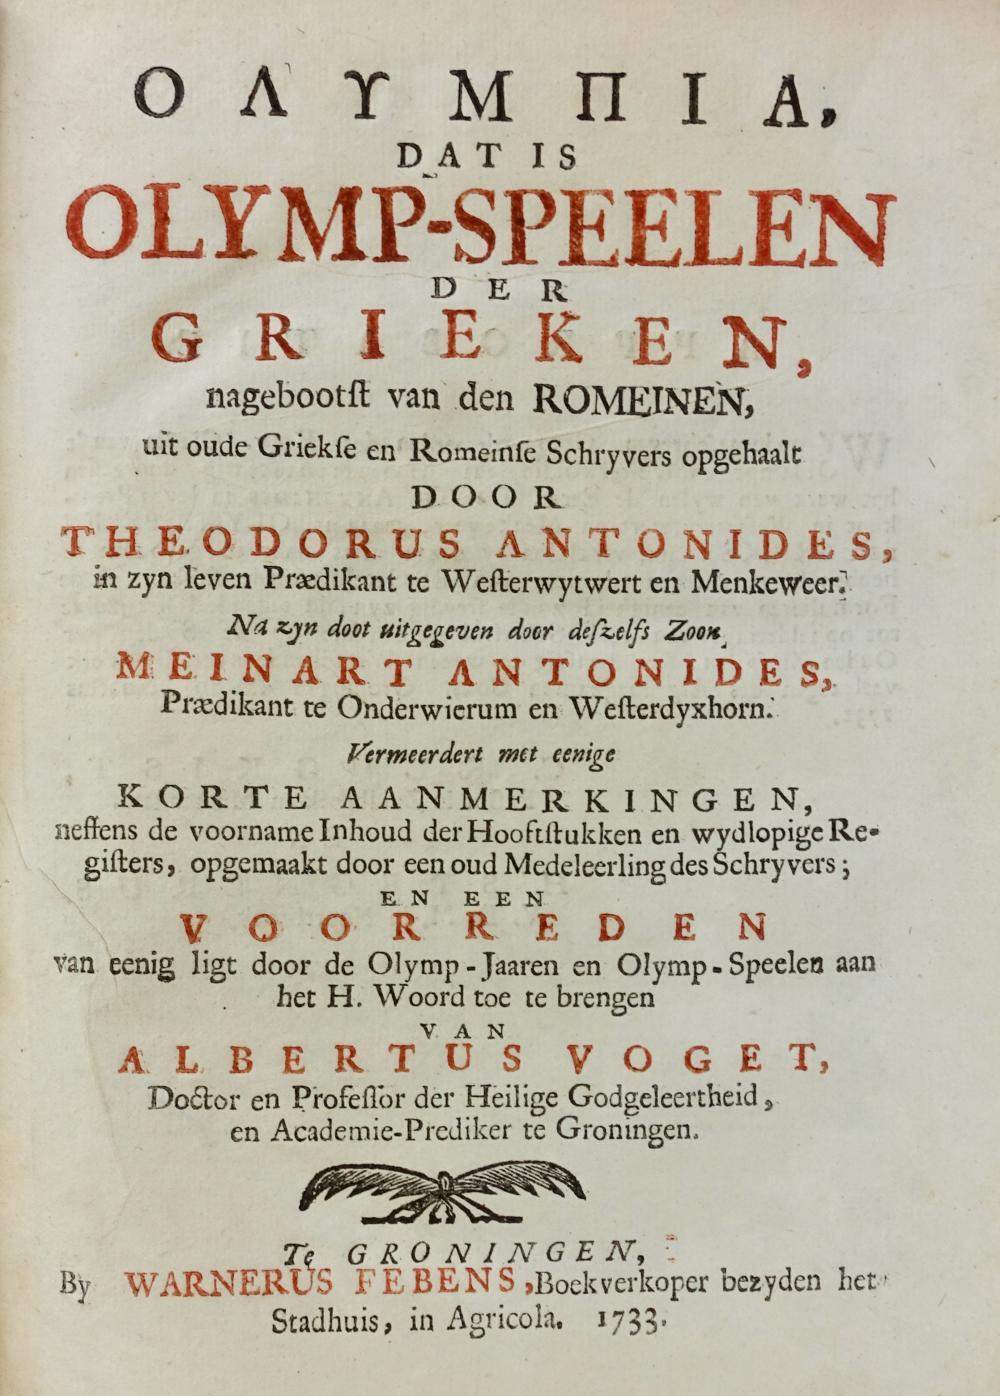 OLYMPIC GAMES -- ANTONIDES, Th. Olympia, dat is olymp-speelen der Grieken, nagebootst